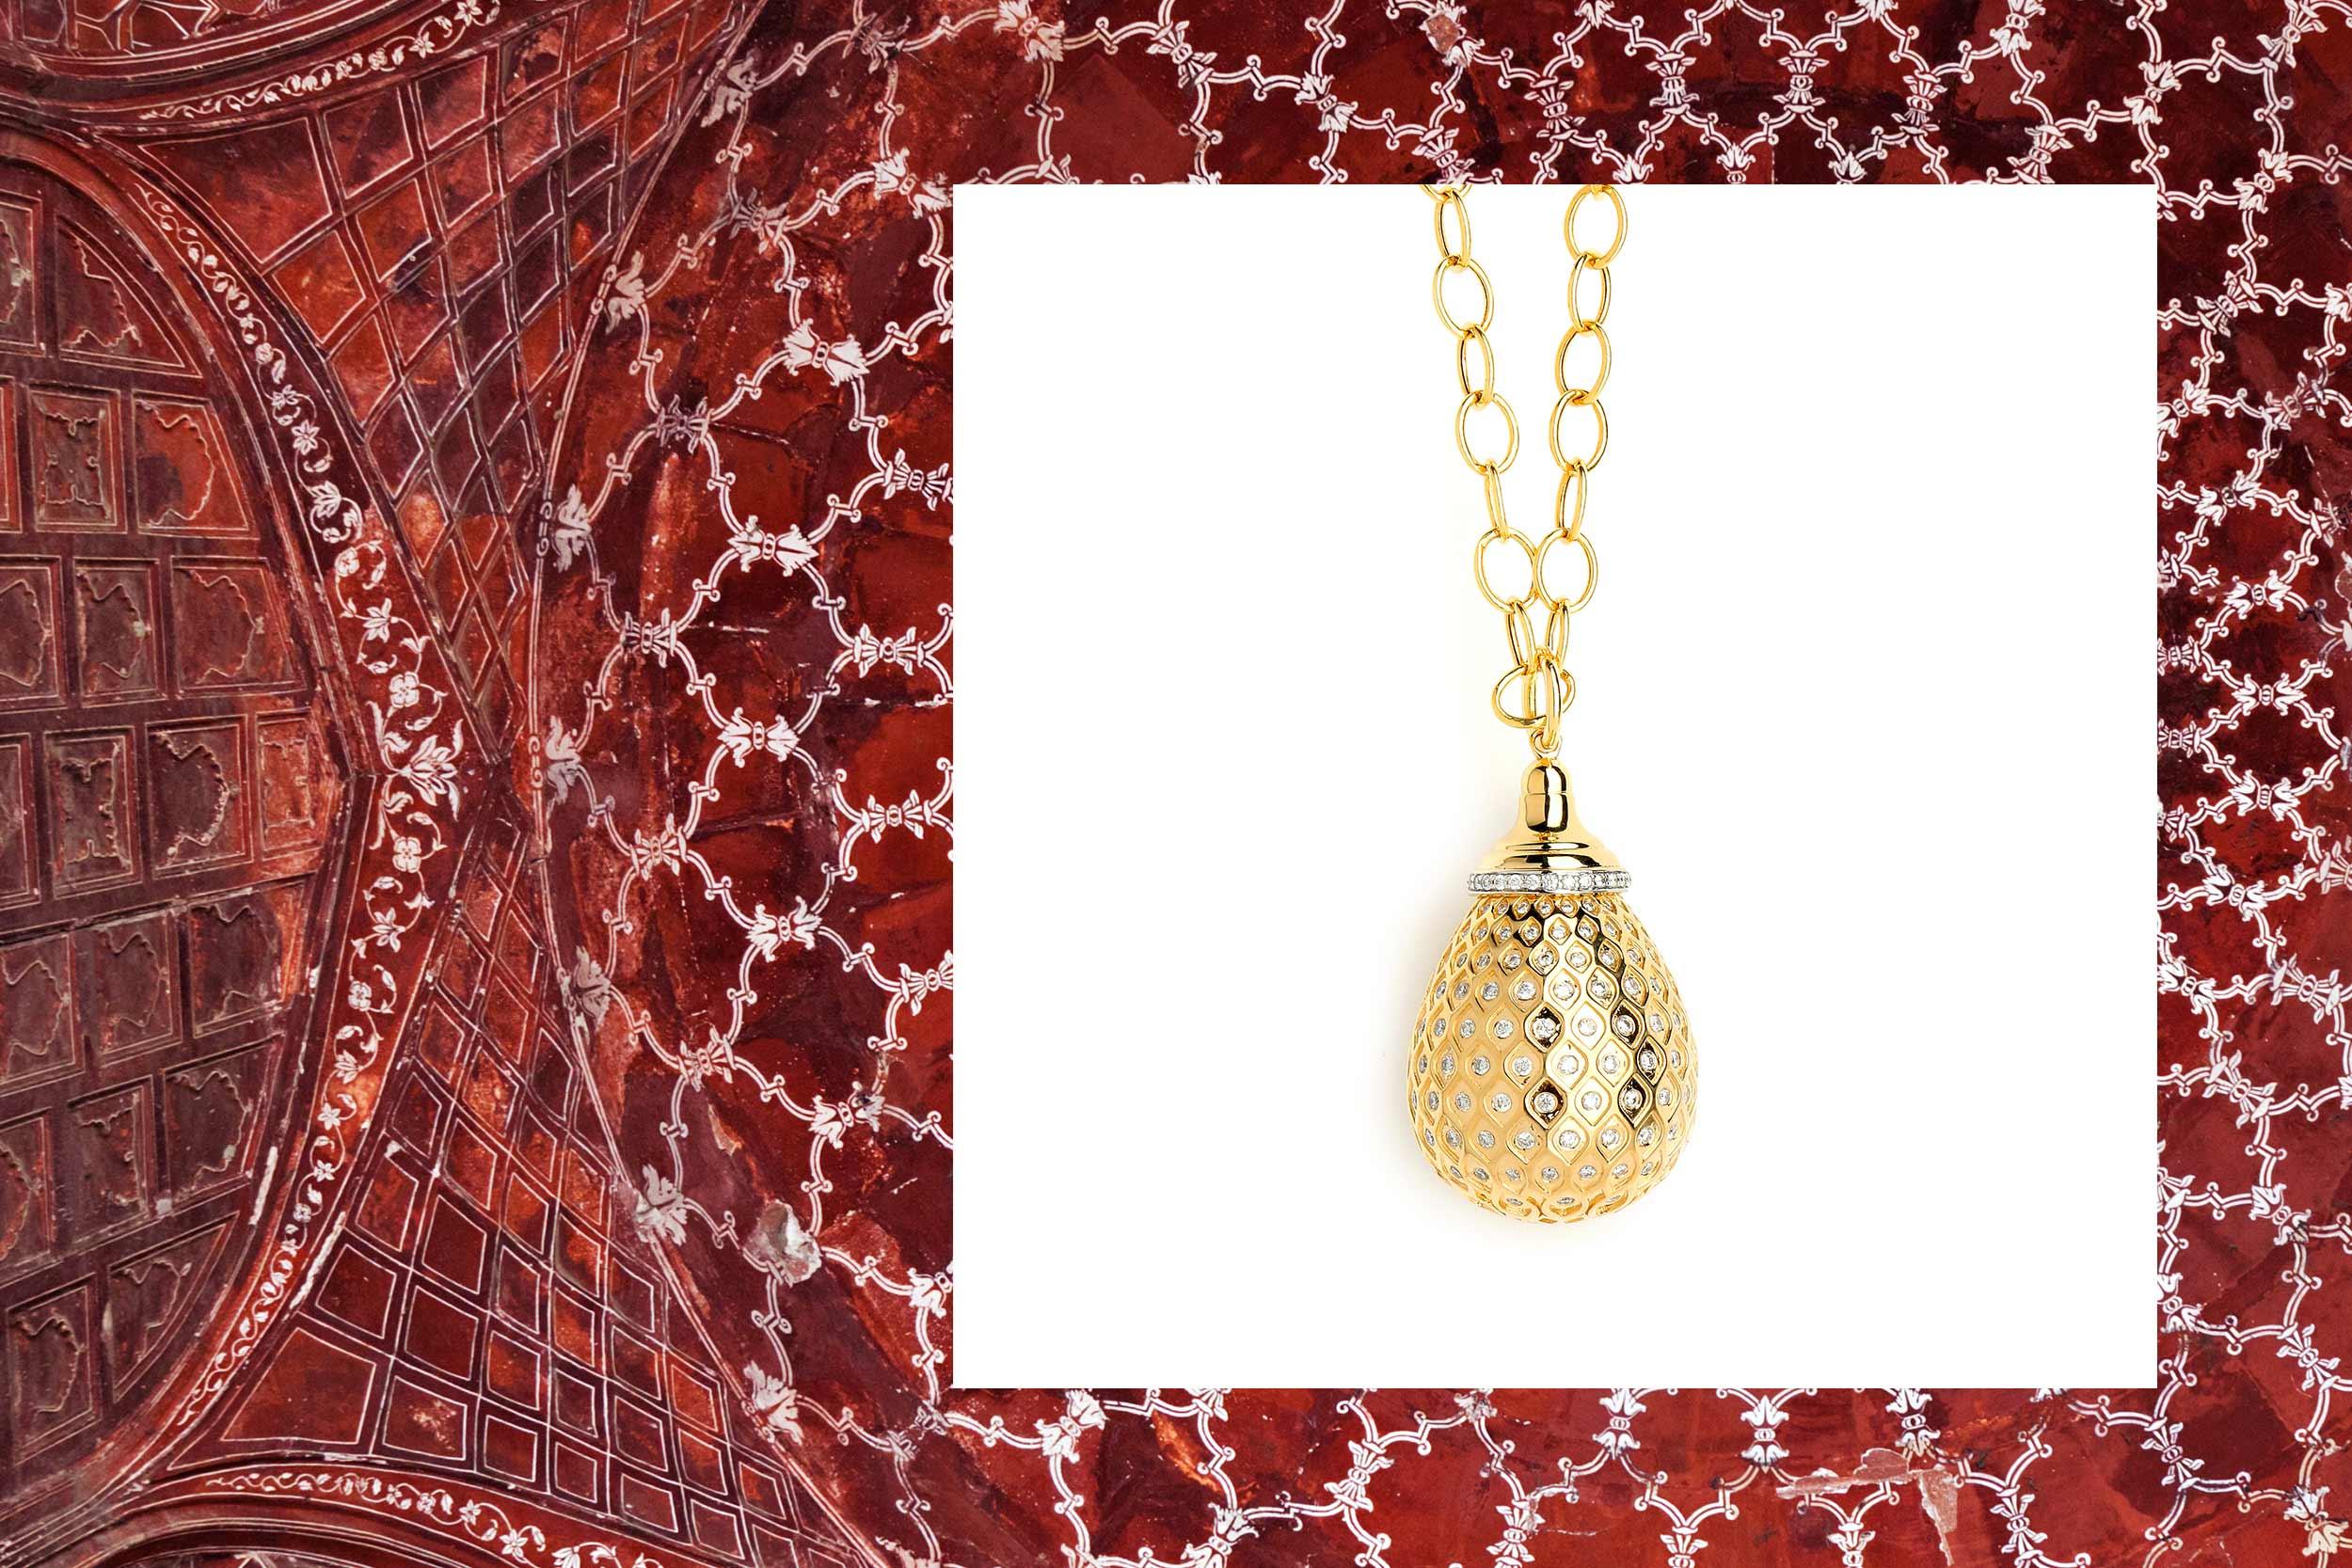 18kyg mogul drop necklace with champagne diamonds